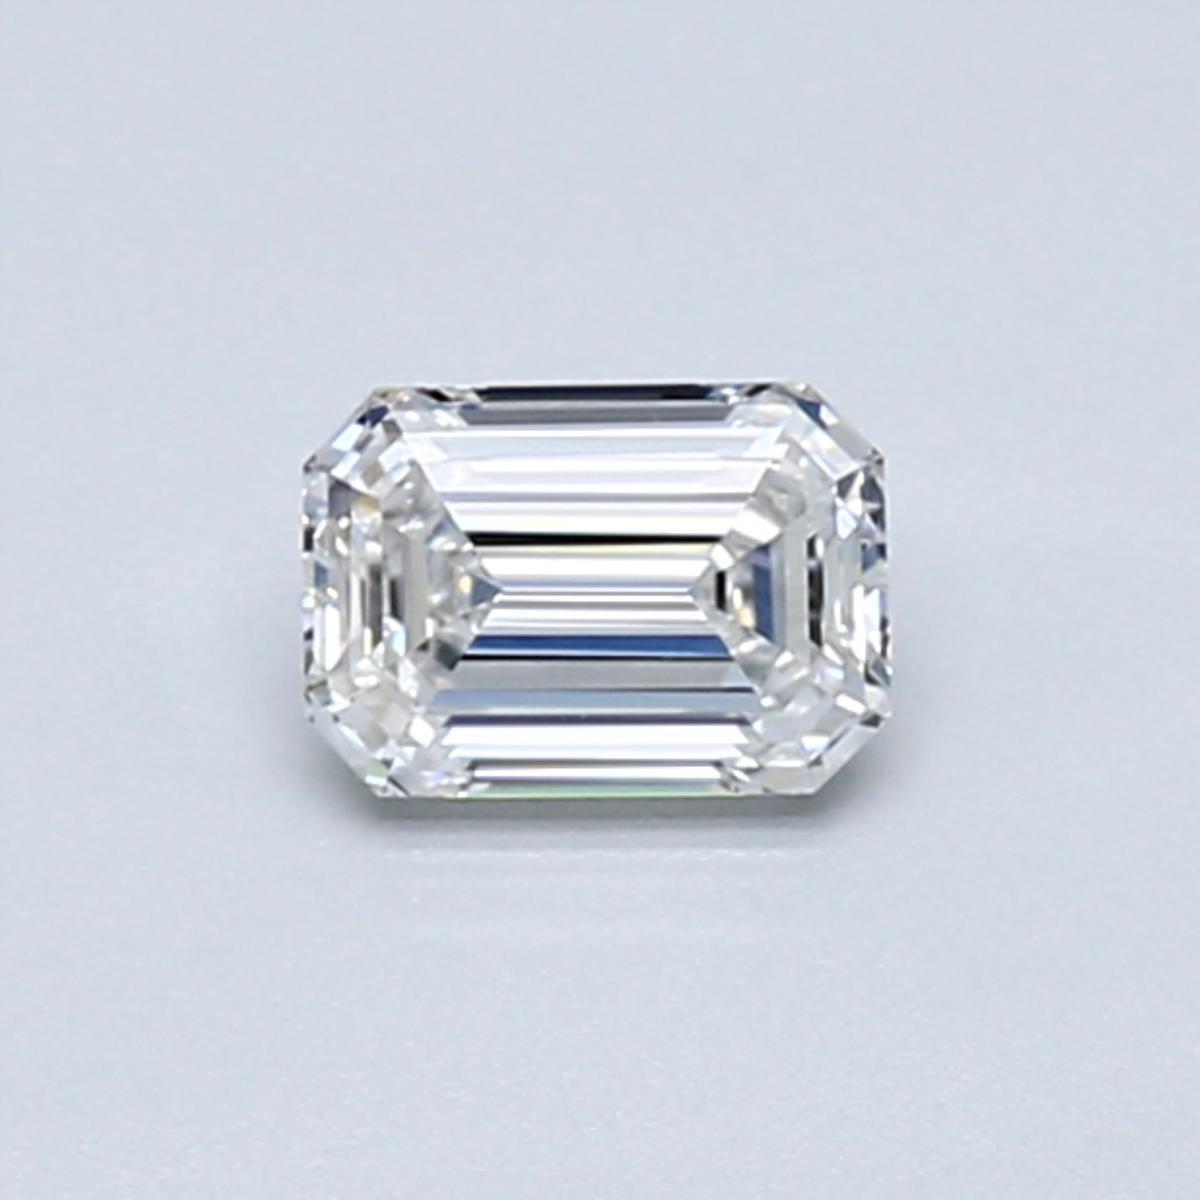 .45 carat Emerald Diamond, Very Good cut, graded by the GIA laboratories.